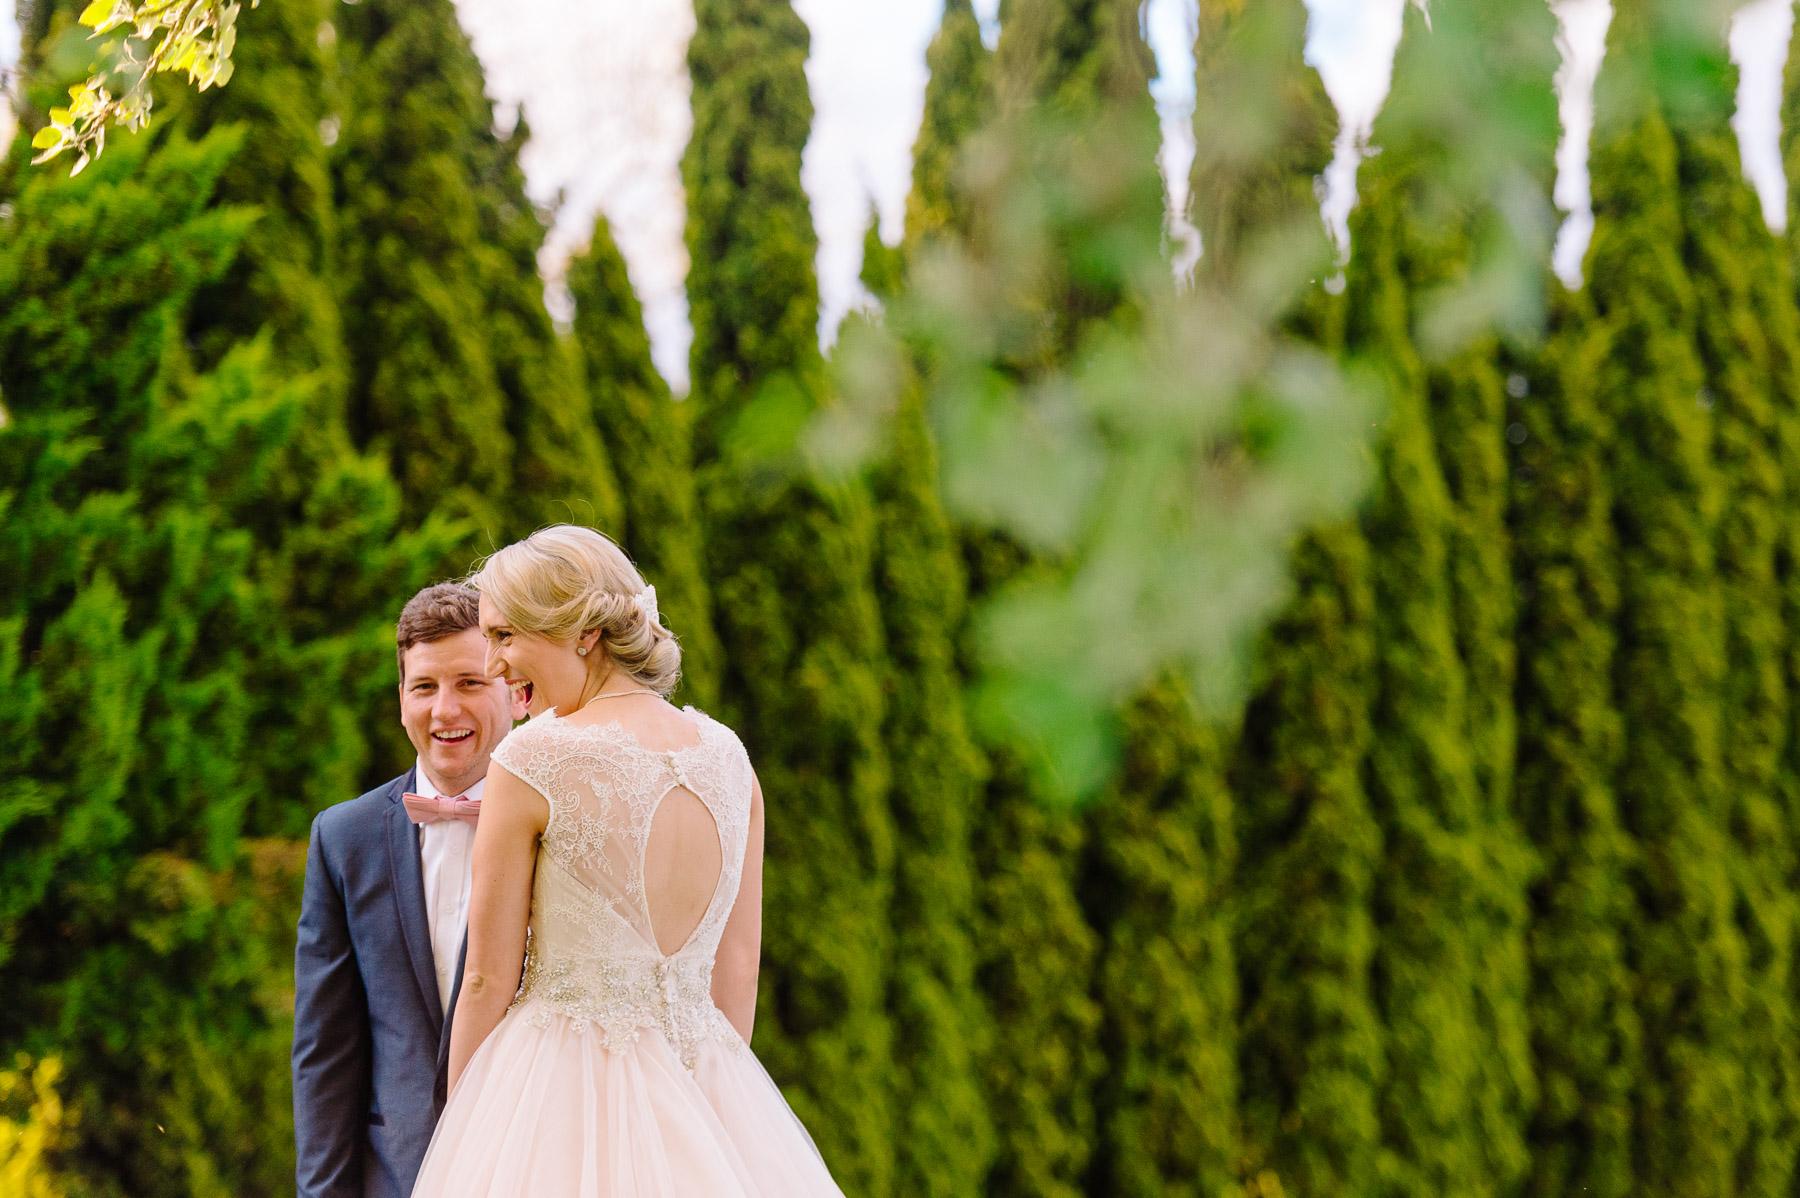 Marnie_and_Charlie_Yarra_Valley_Wedding_Blog-74.jpg